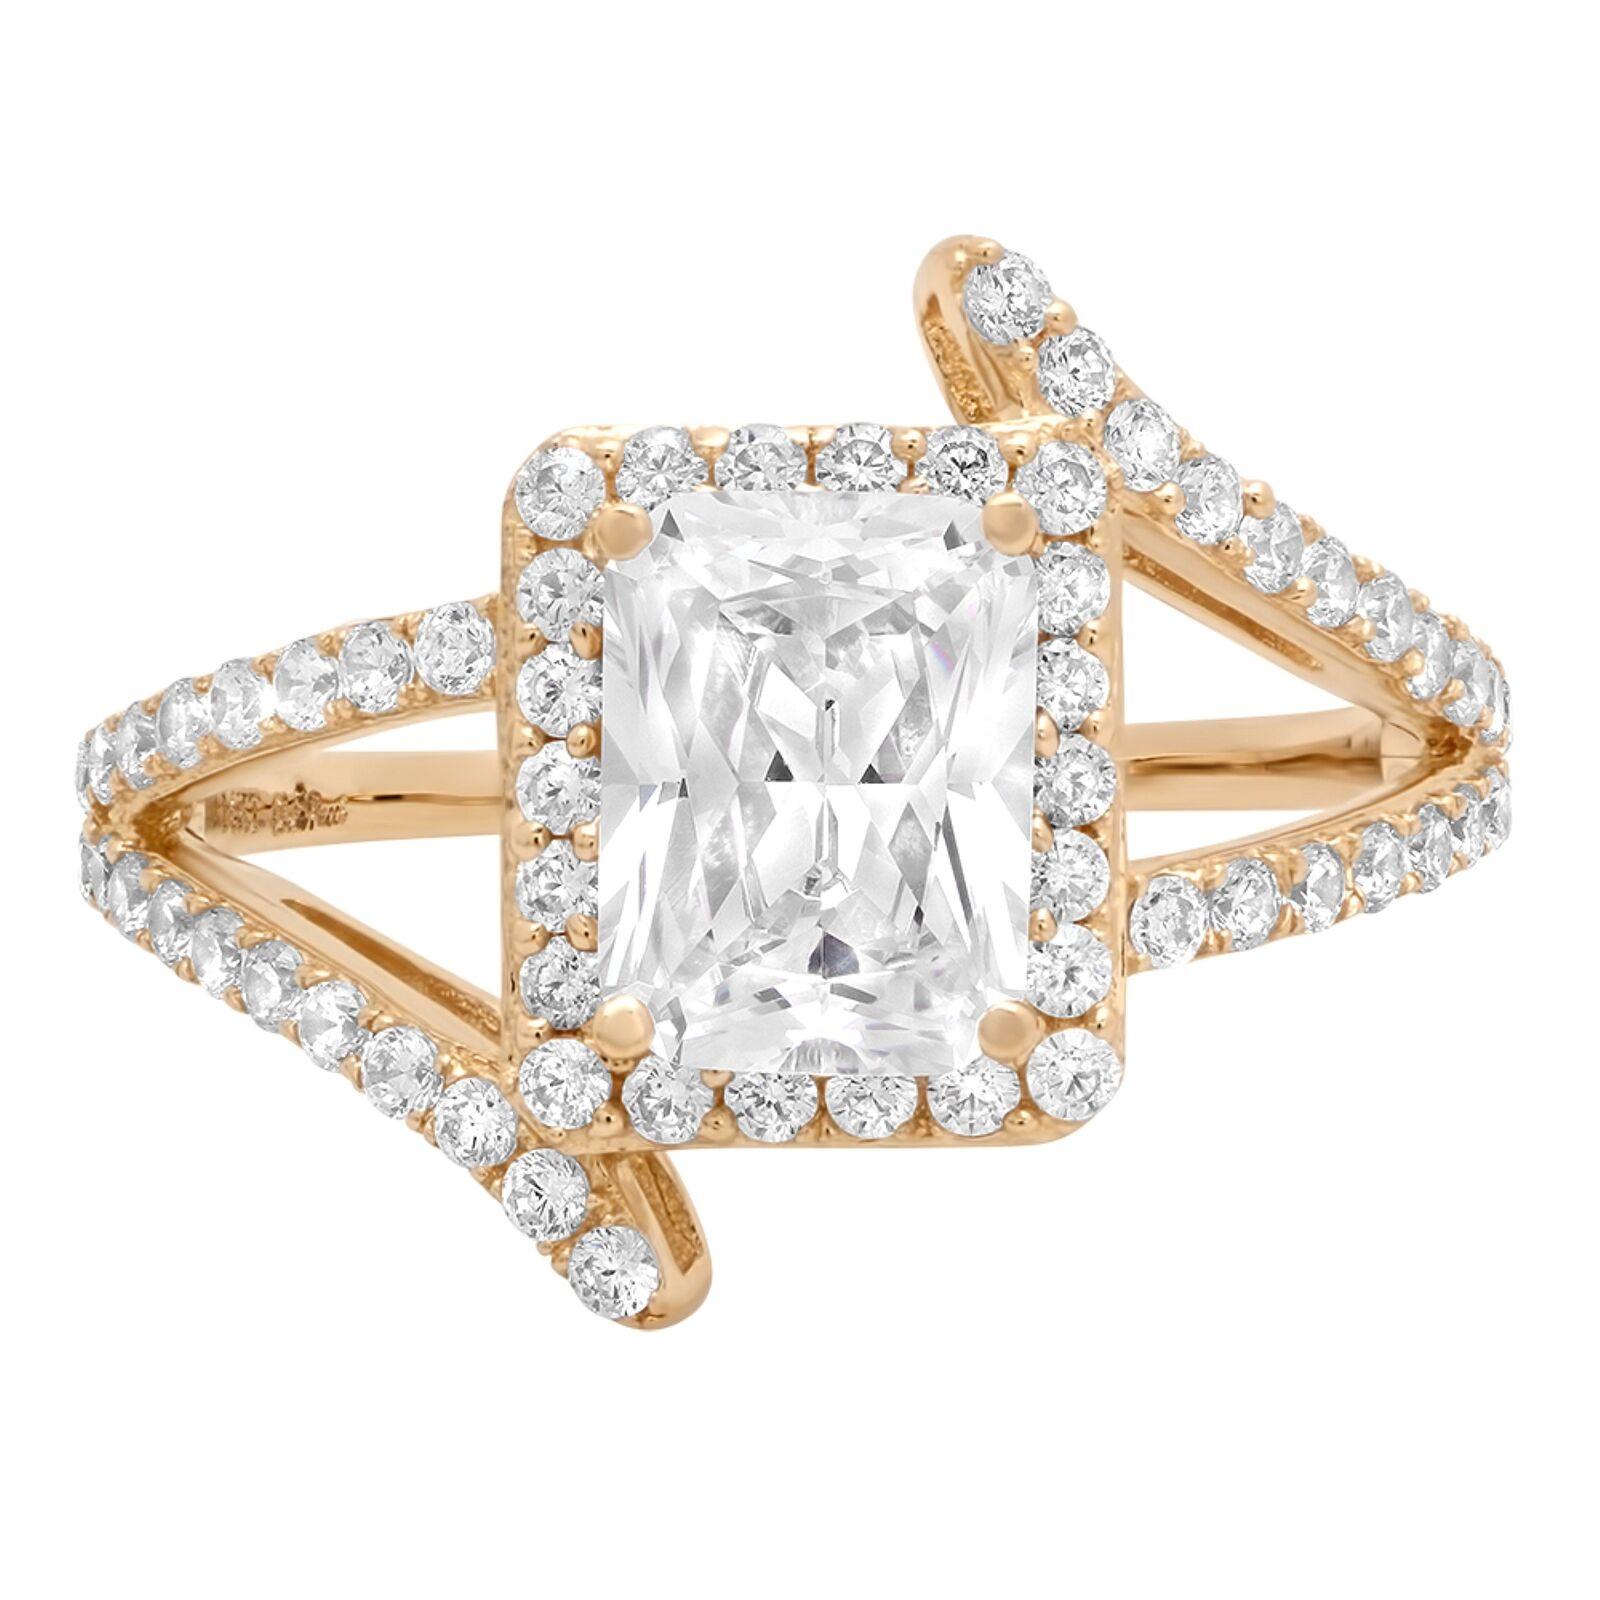 2.10ct Emerald Cut Designer Engagement Wedding Anniversary Ring 14k Yellow gold